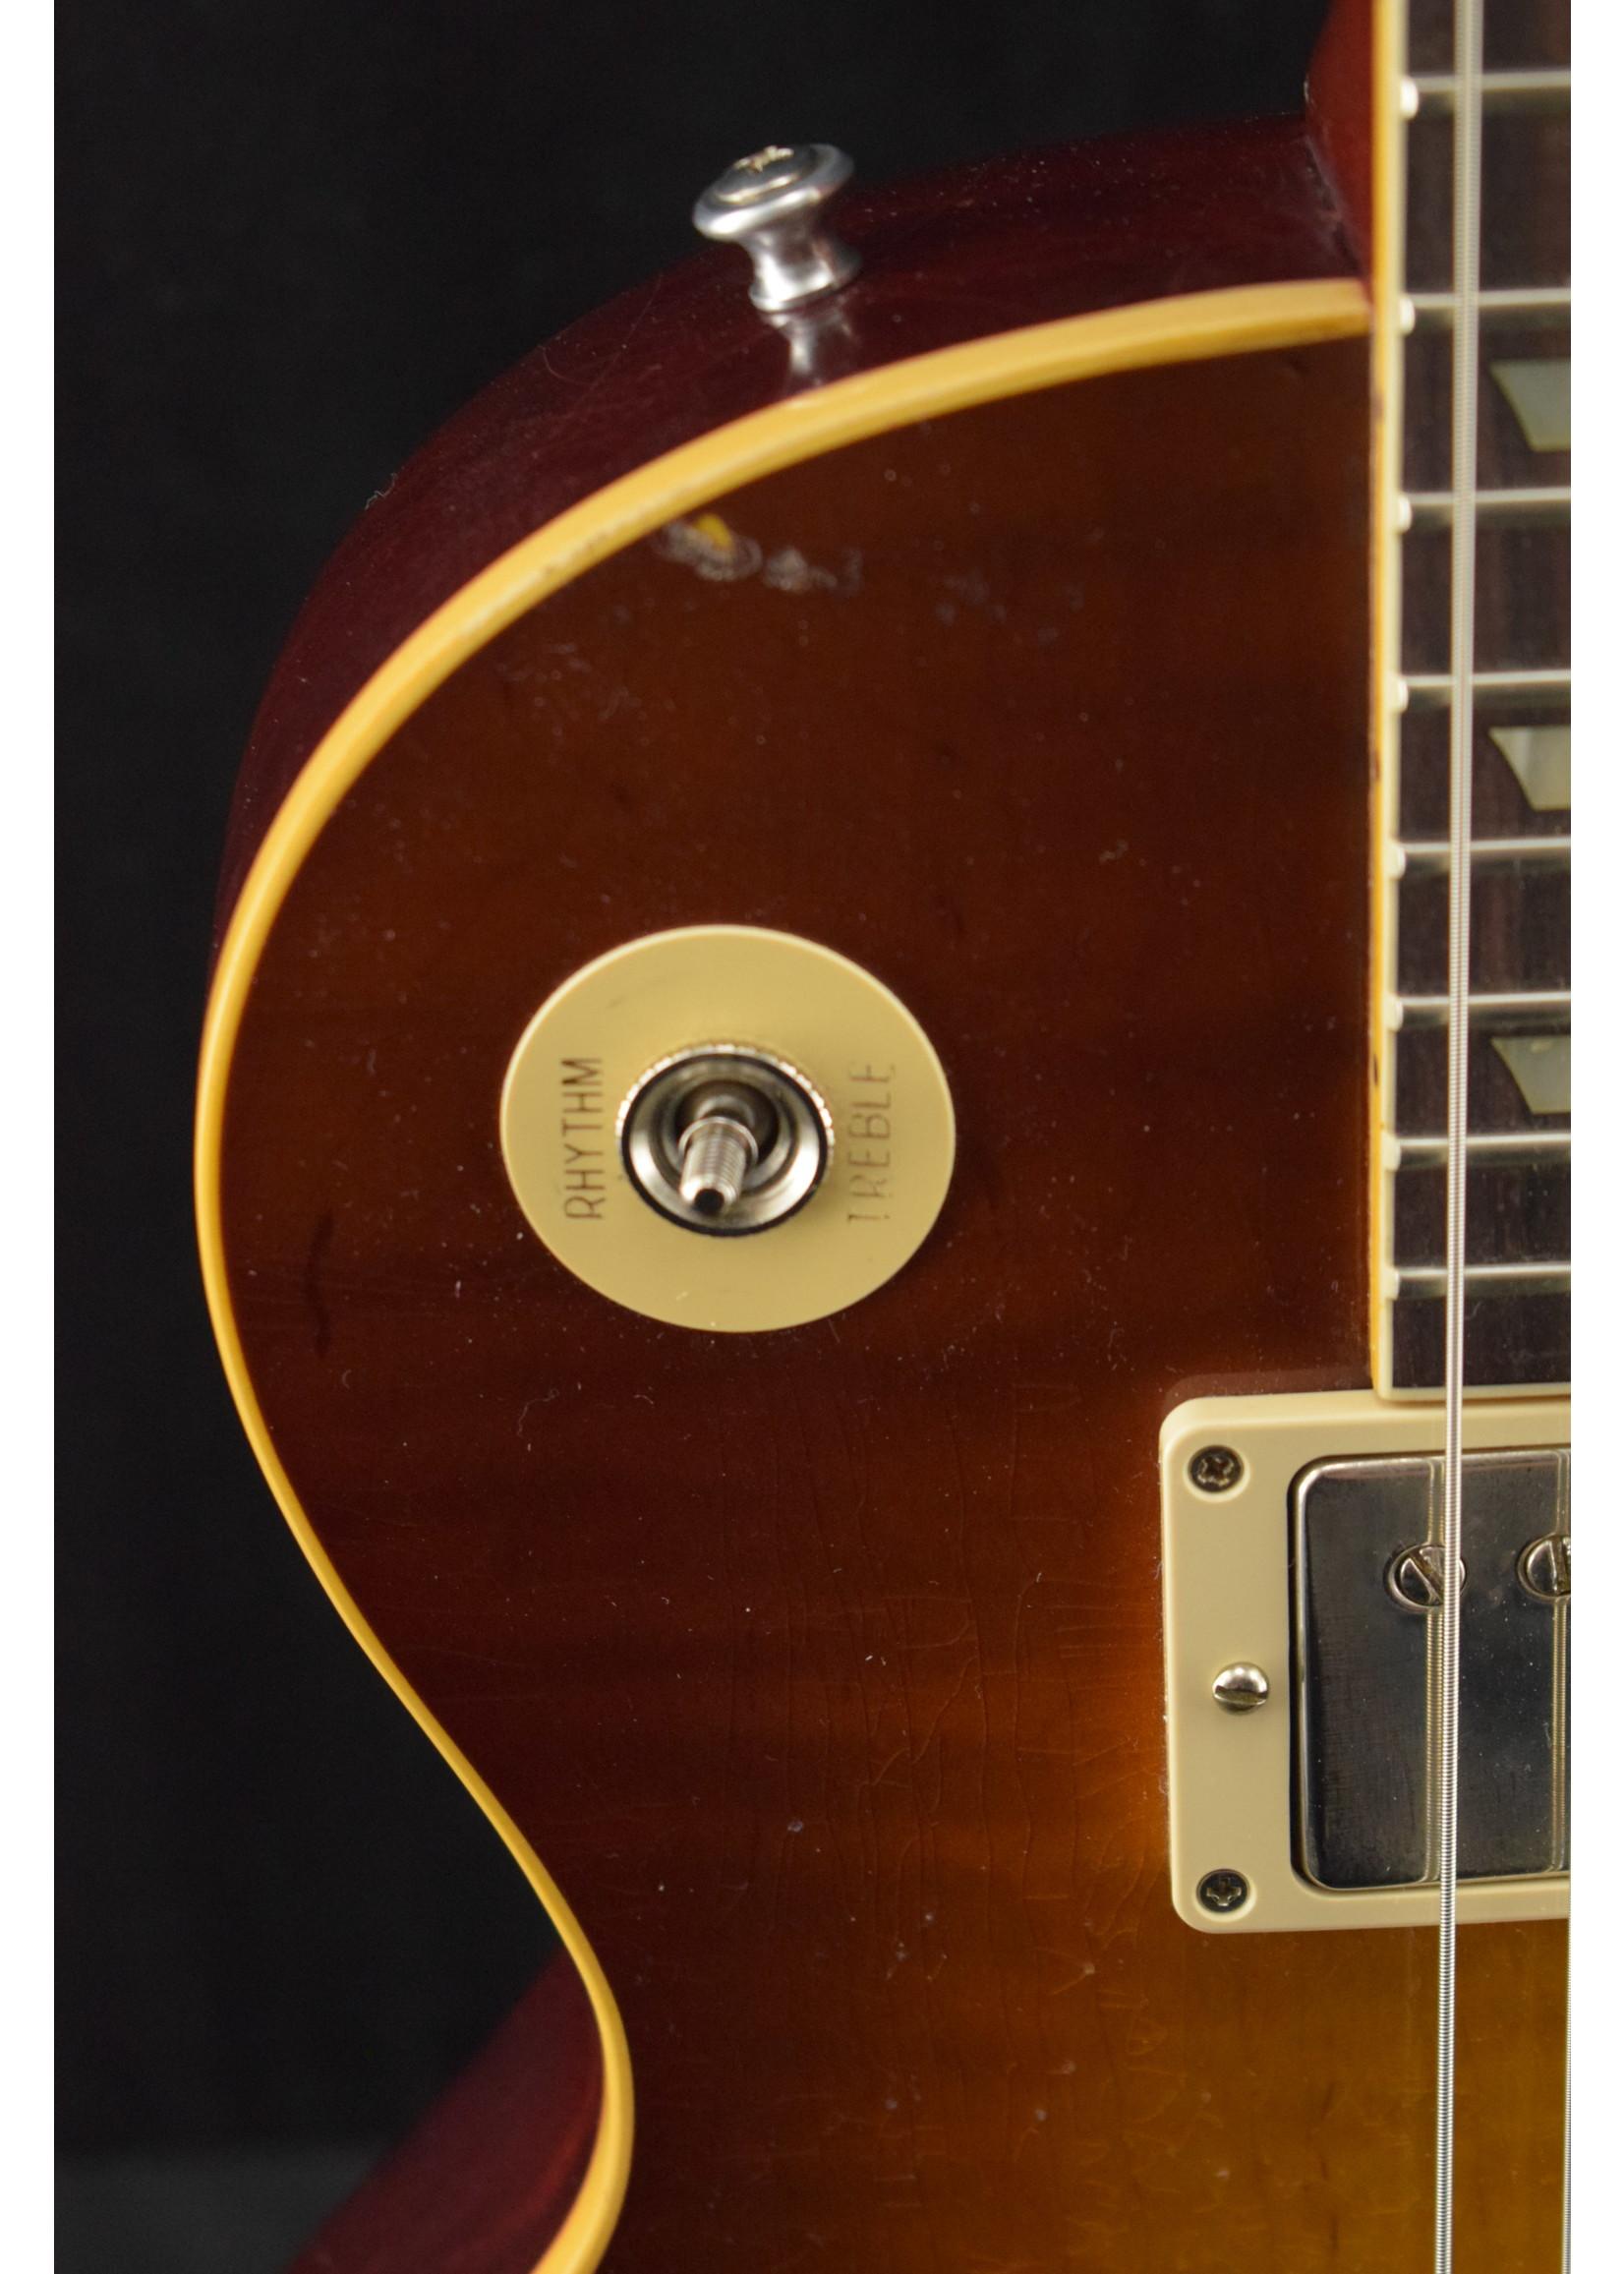 Gibson Gibson Murphy Lab 1959 Les Paul Standard Cherry Tea Burst Light Aged